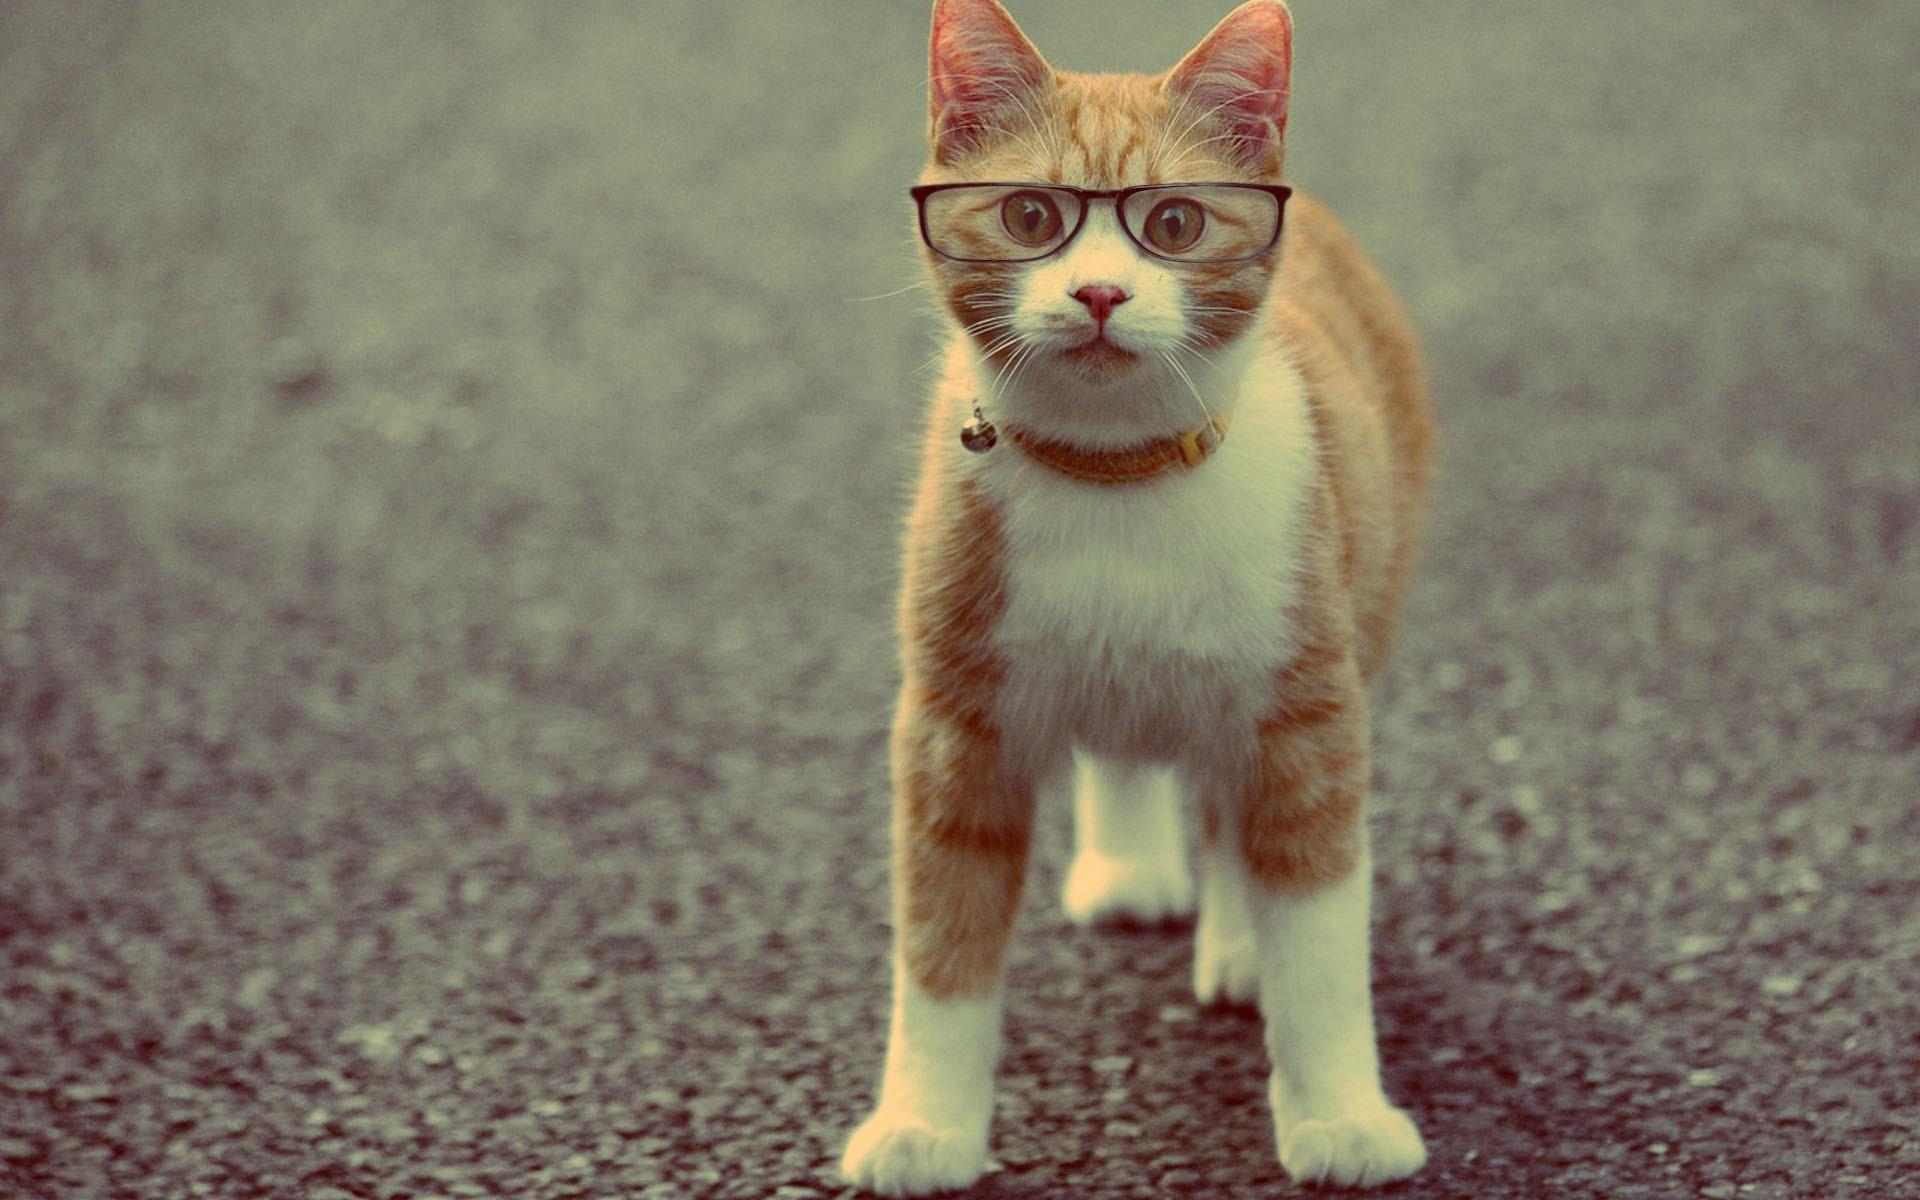 Funny Kitten Wallpaper And Screensavers